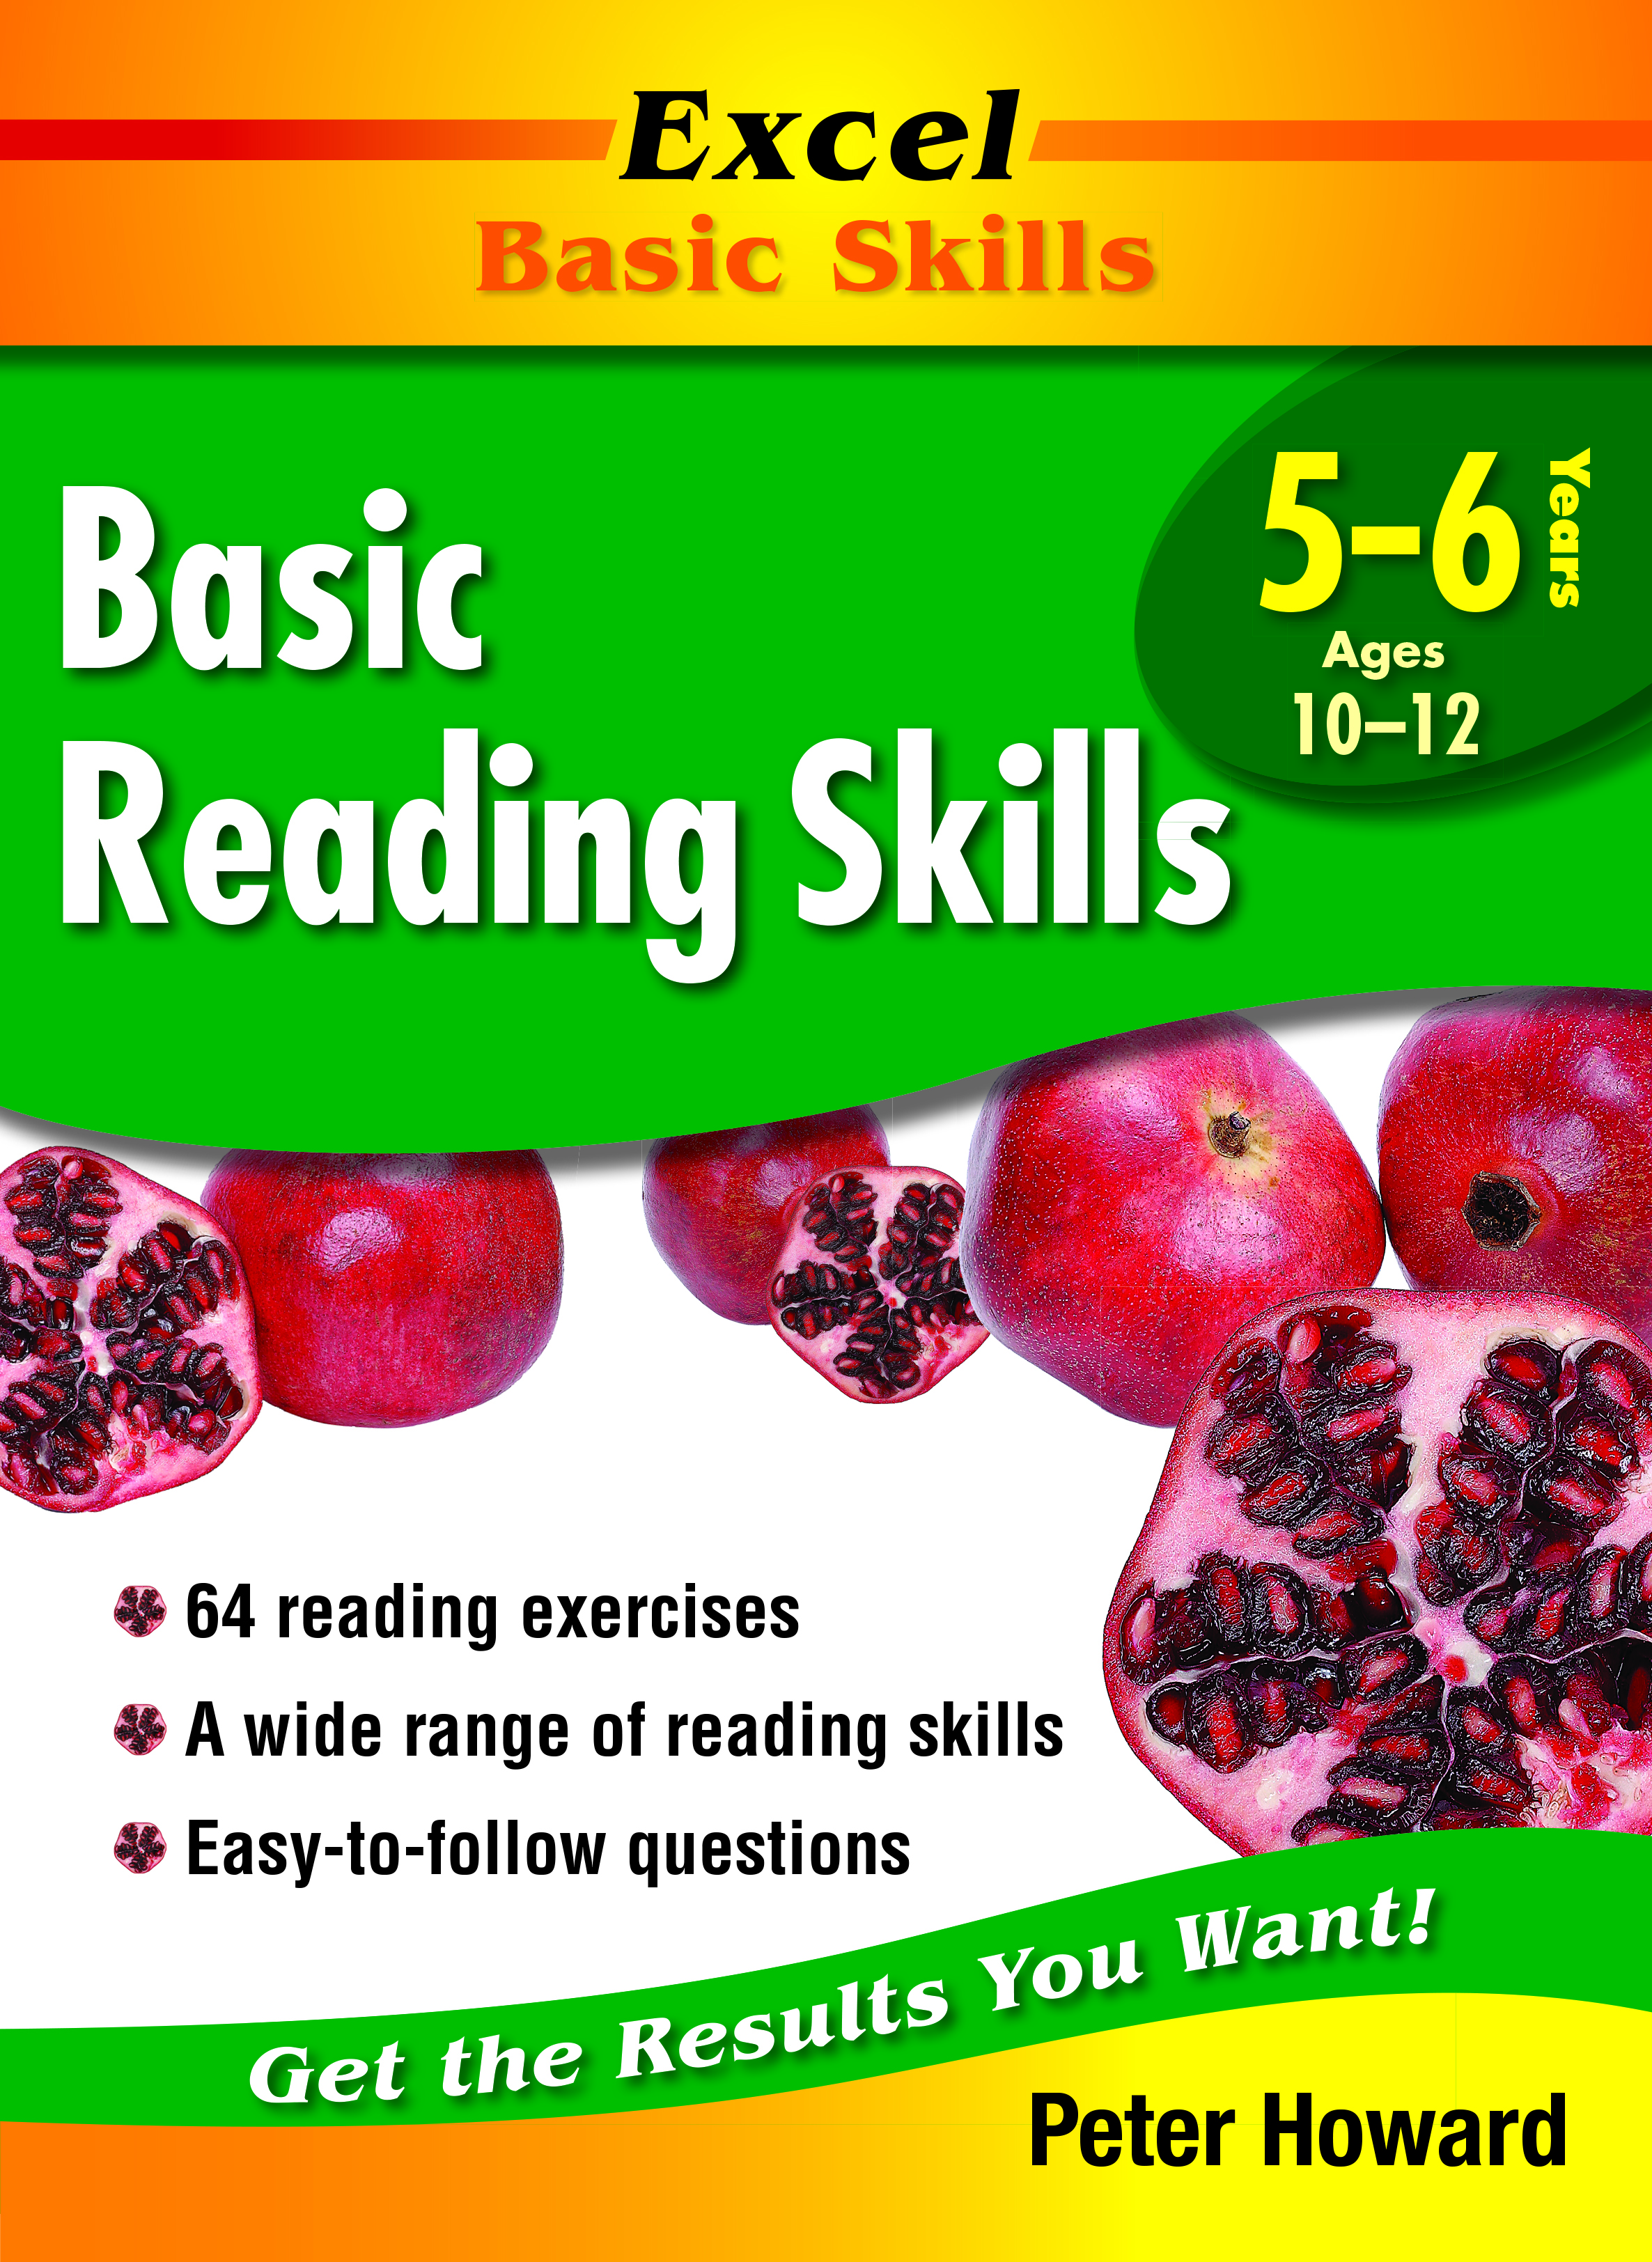 Excel Basic Skills Workbook: Basic Reading Skills Years 5-6